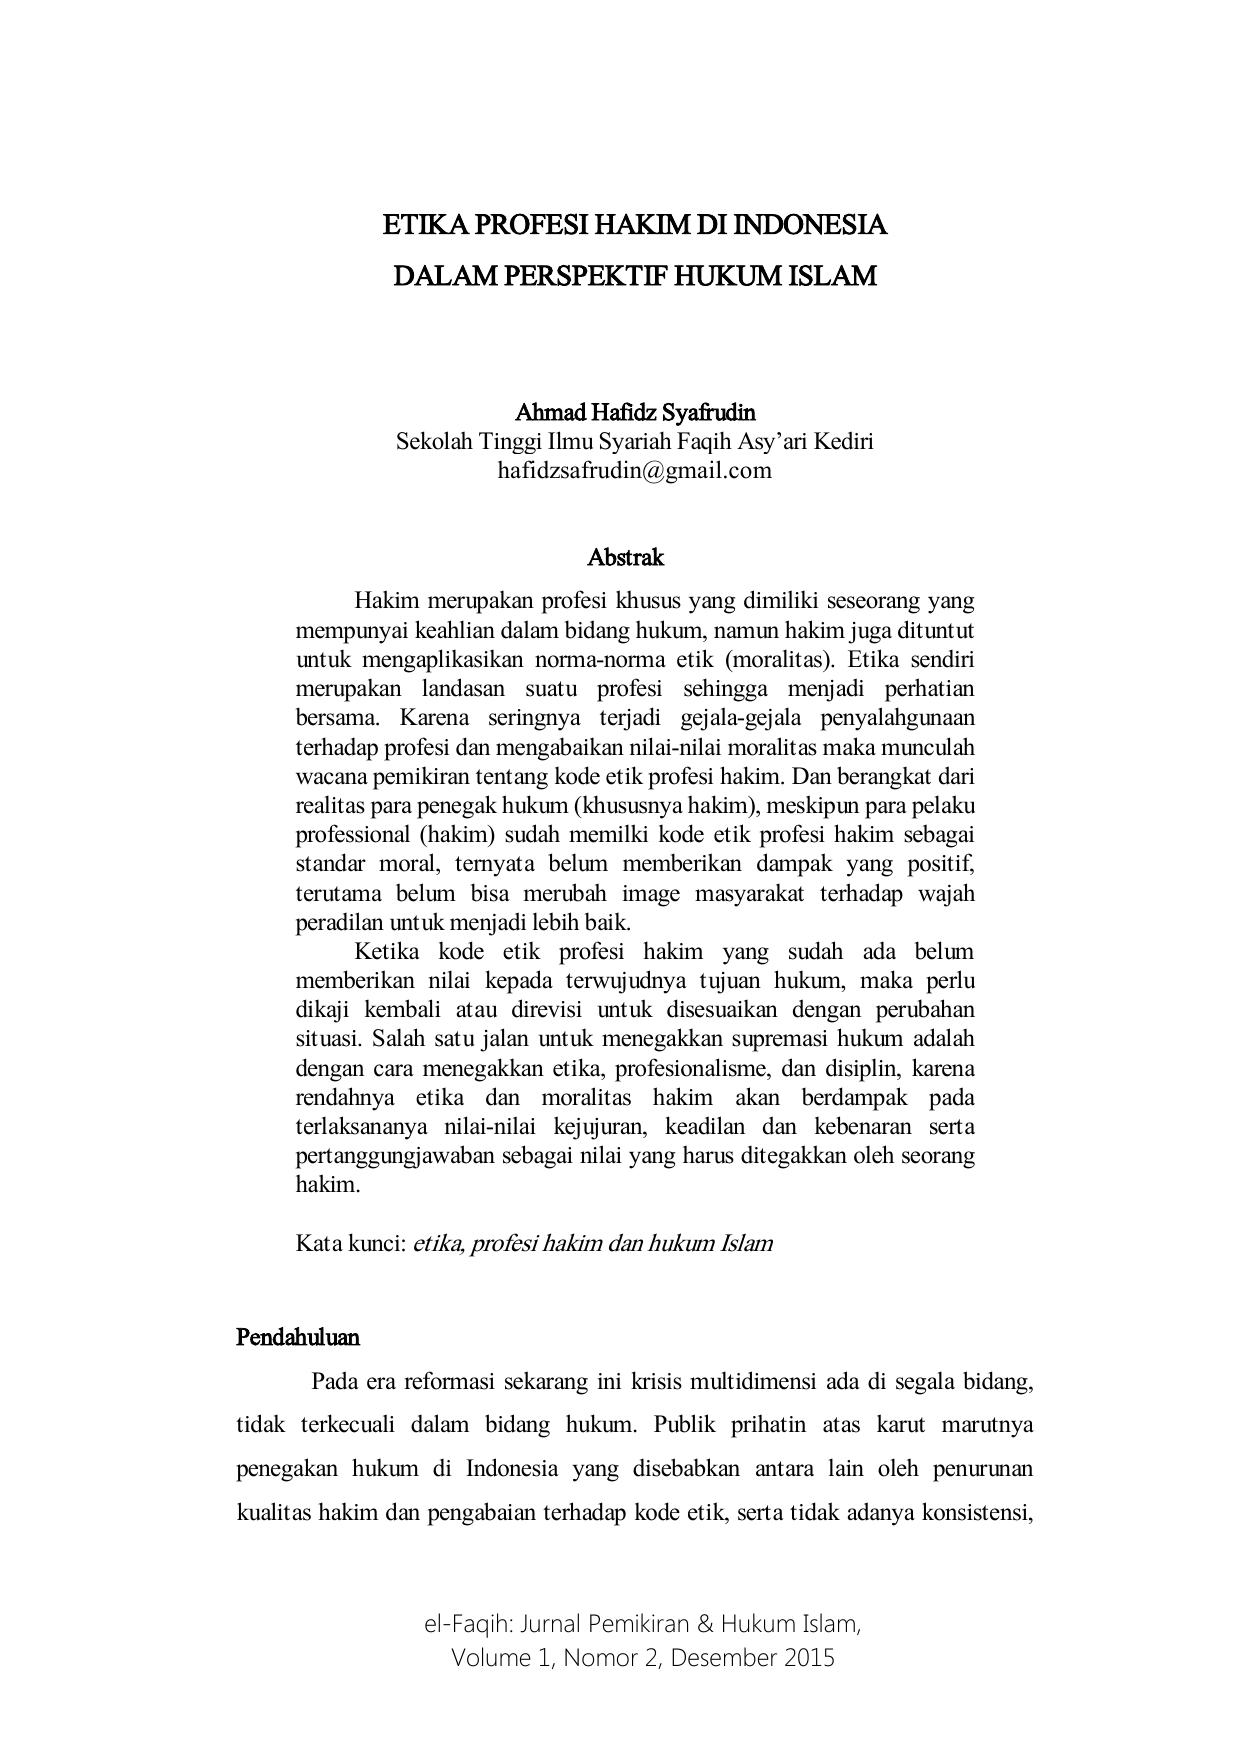 Etika Profesi Hakim Di Indonesia Dalam Perspektif Hukum Islam